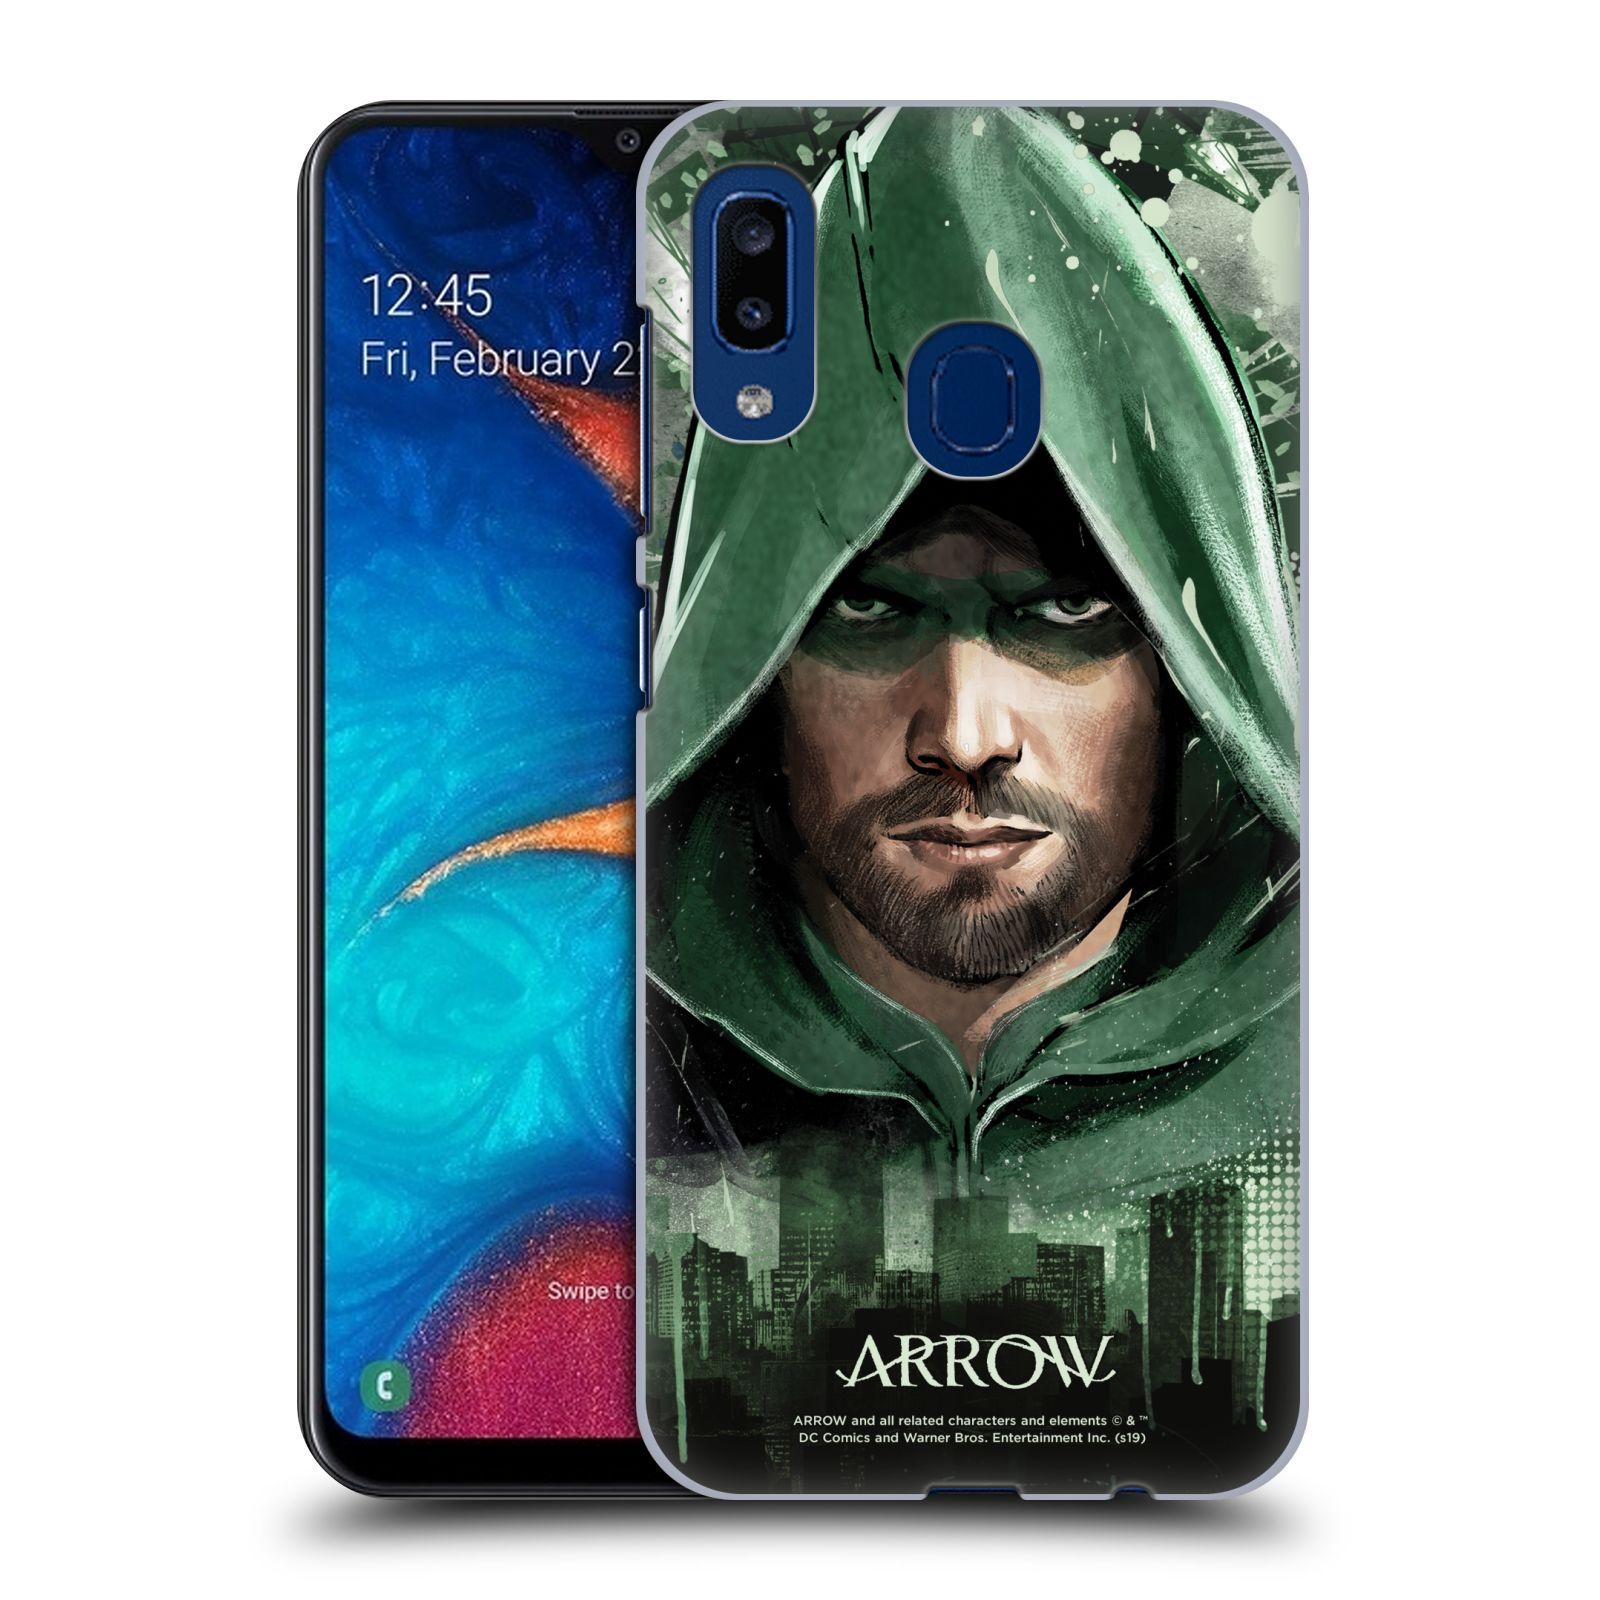 Pouzdro na mobil Samsung Galaxy A20 - HEAD CASE - Seriál Arrow - kreslený motiv